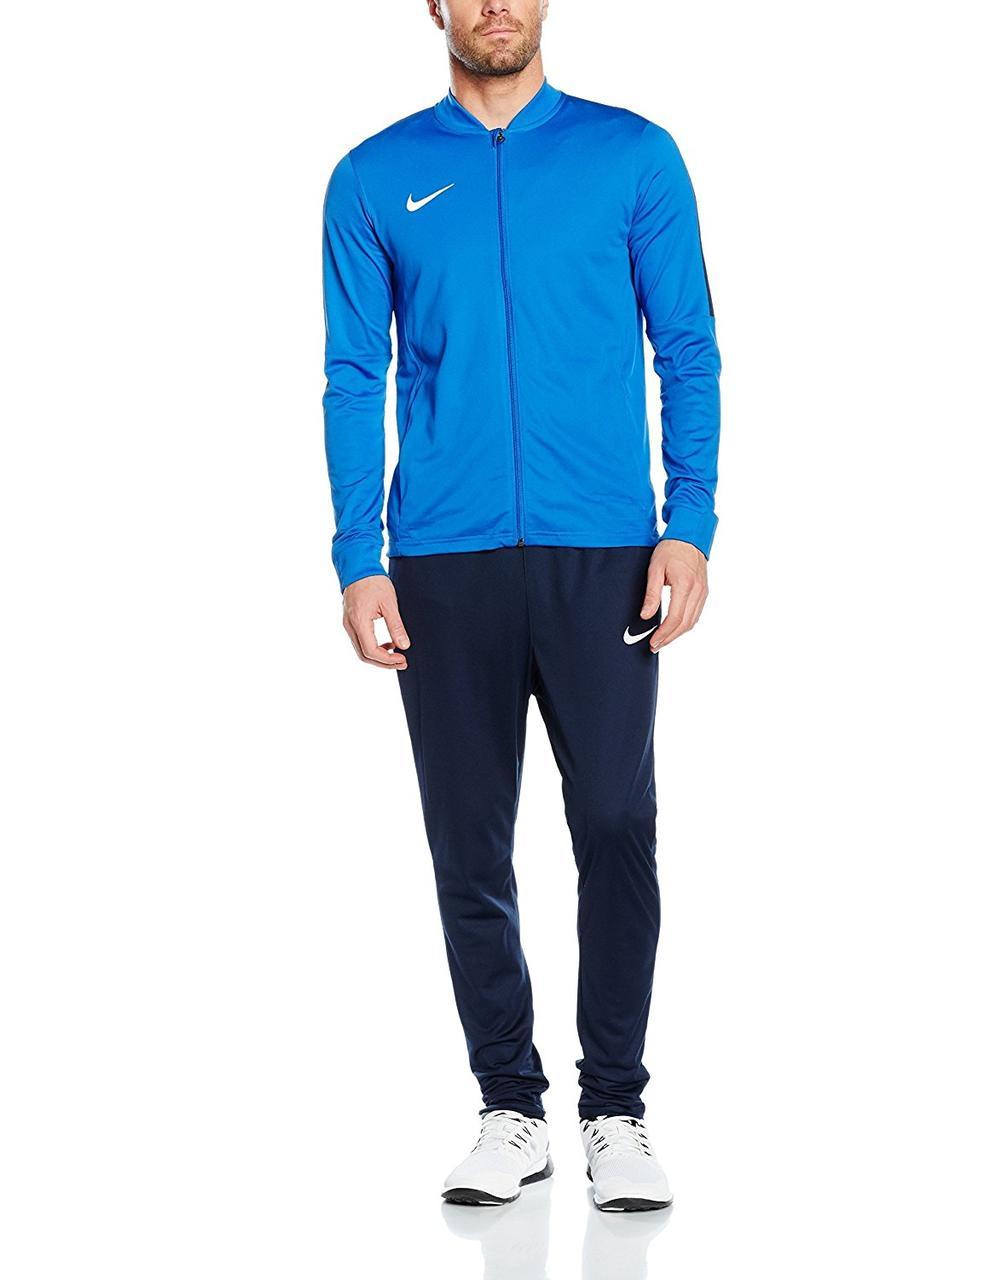 548086c9 Спортивный костюм Nike AcademyTracksuit 808757-463 -